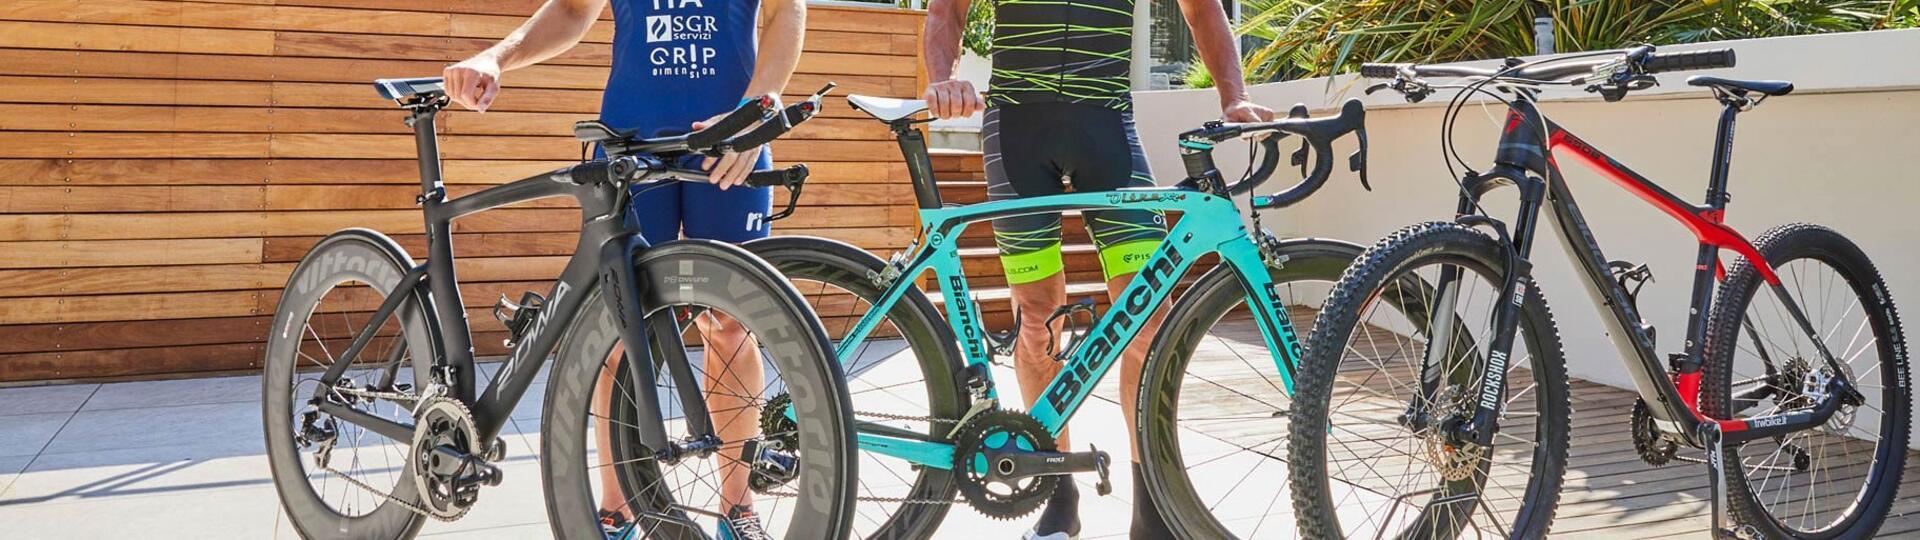 cycling.oxygenhotel de fahrradverleih-rimini 014